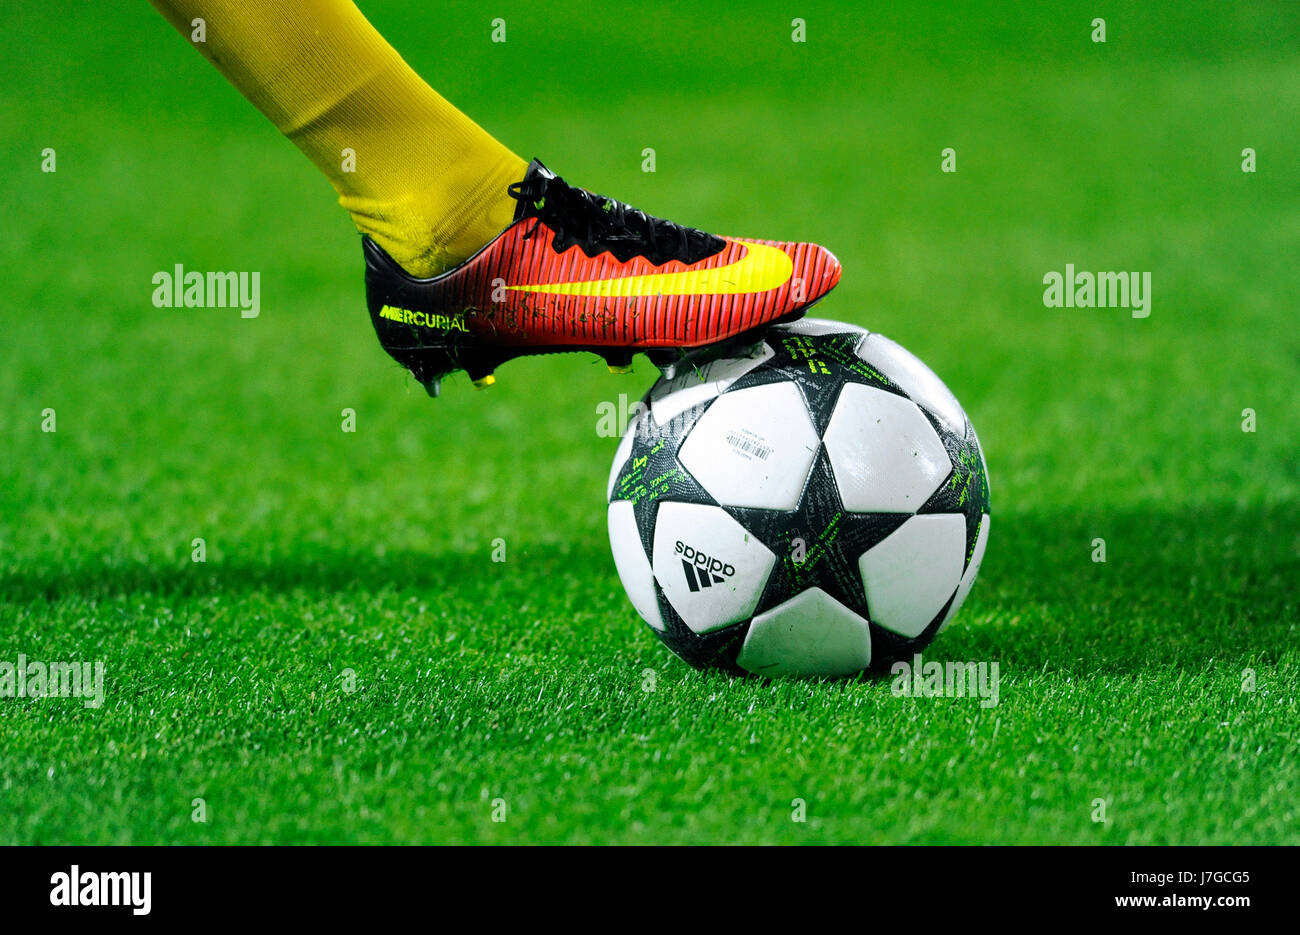 7a137359b46 Nike football shoe on Adidas Champions League Ball